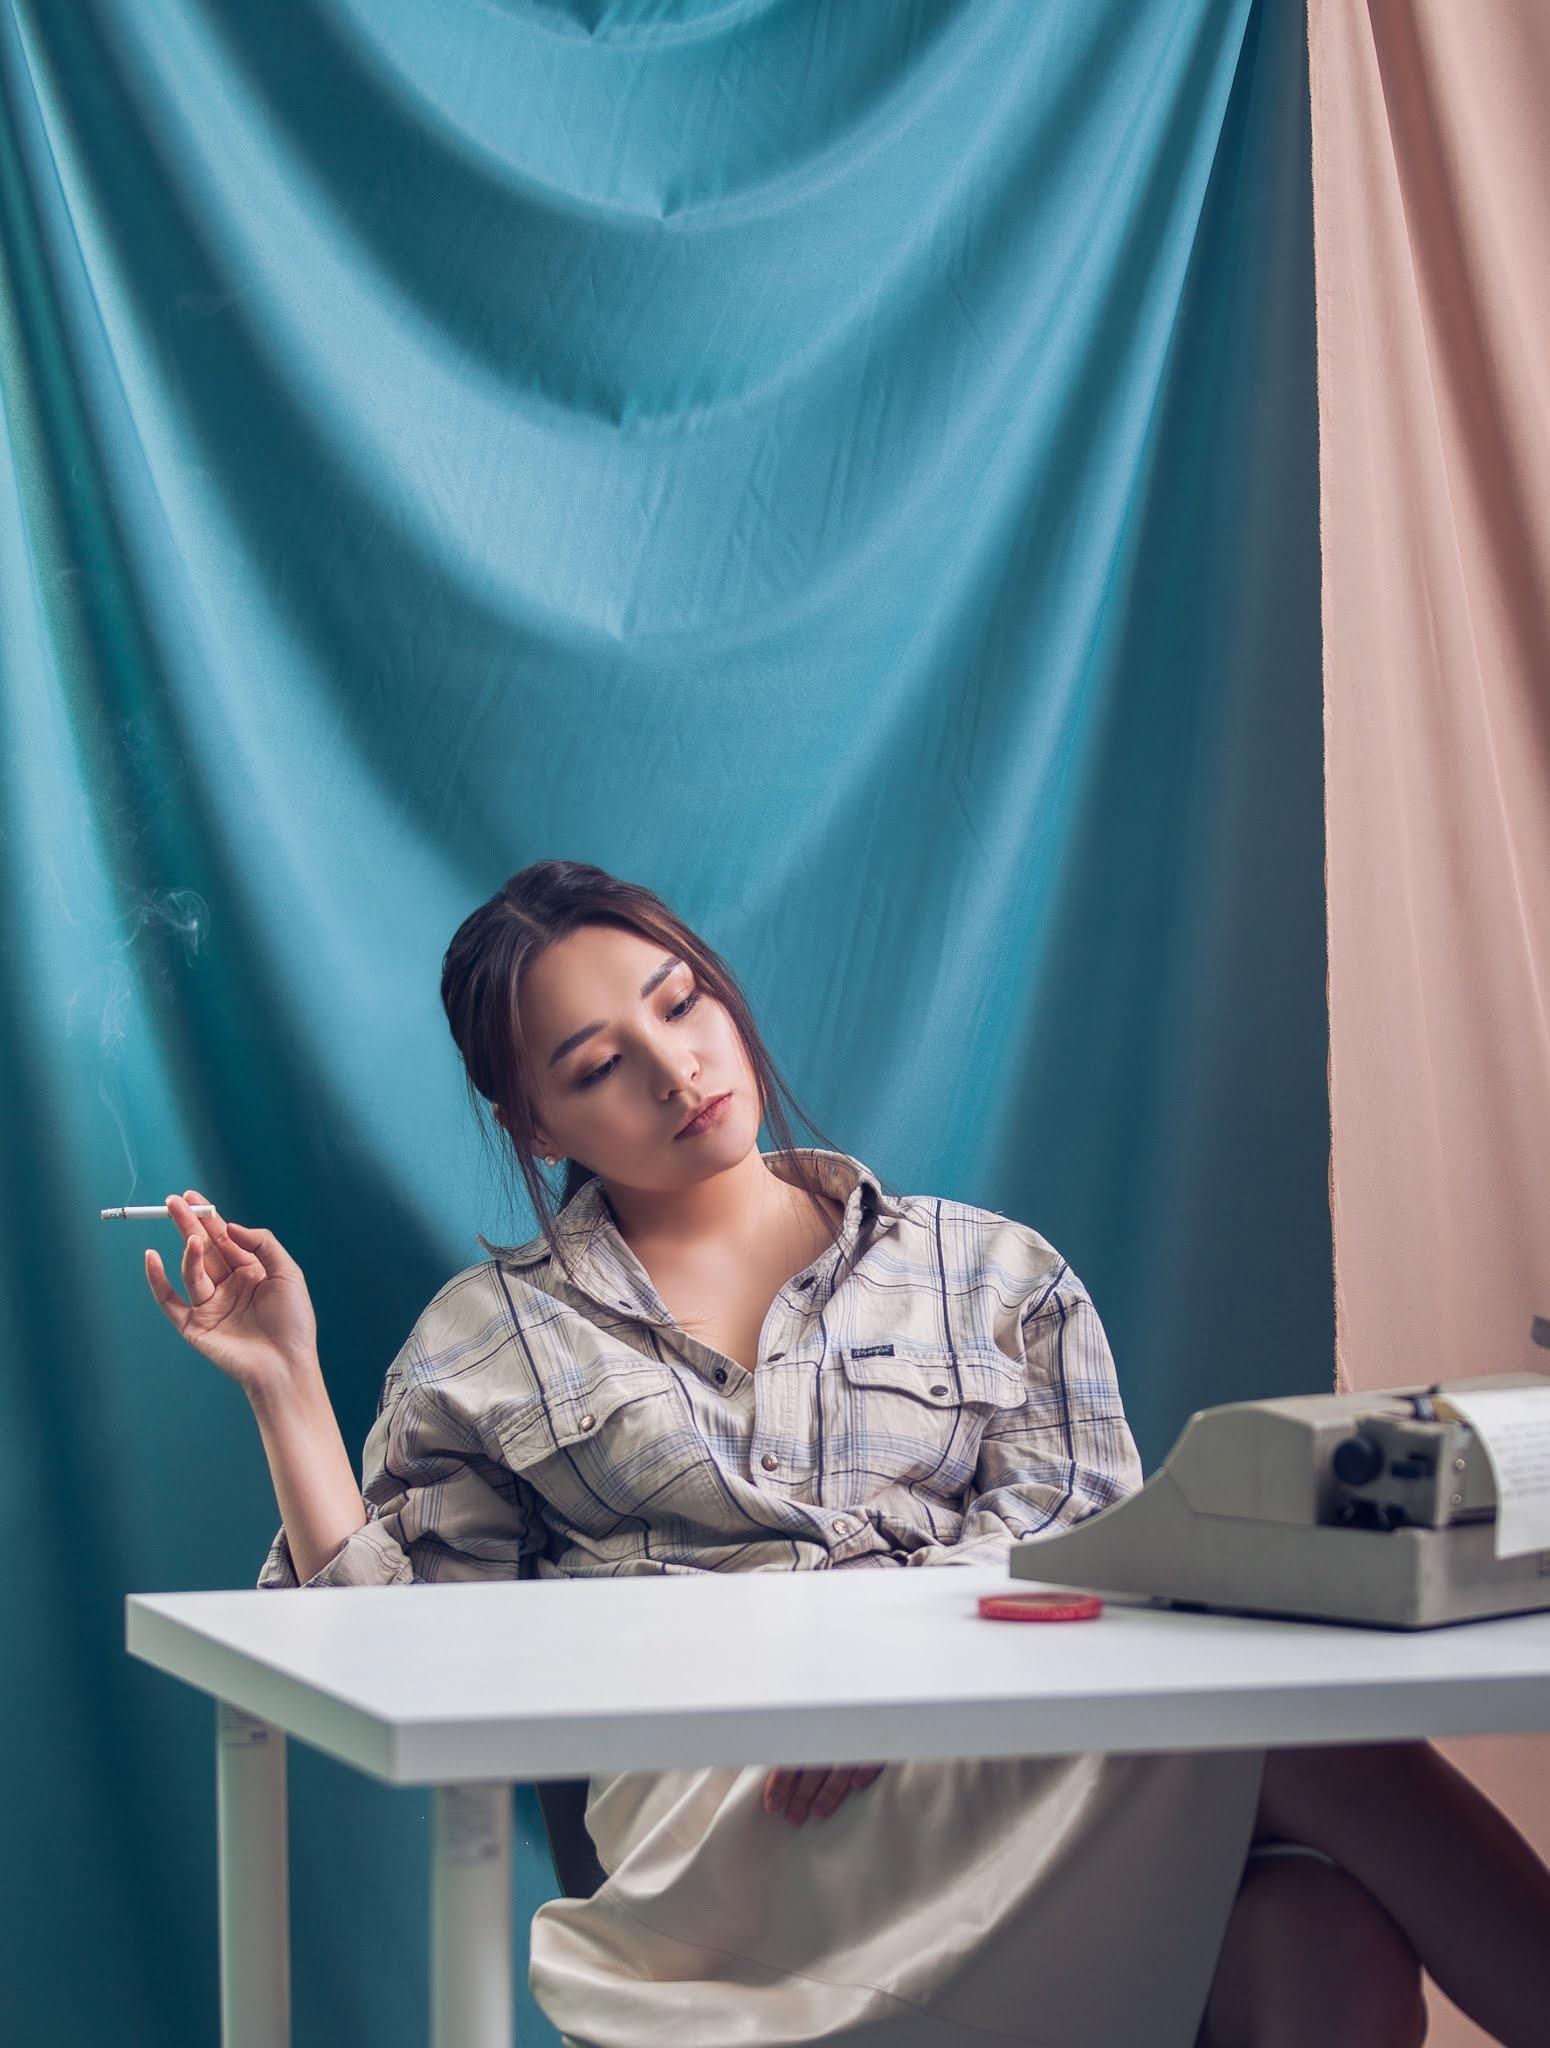 10 Negative Habits You Do Secretly That Make You Toxic